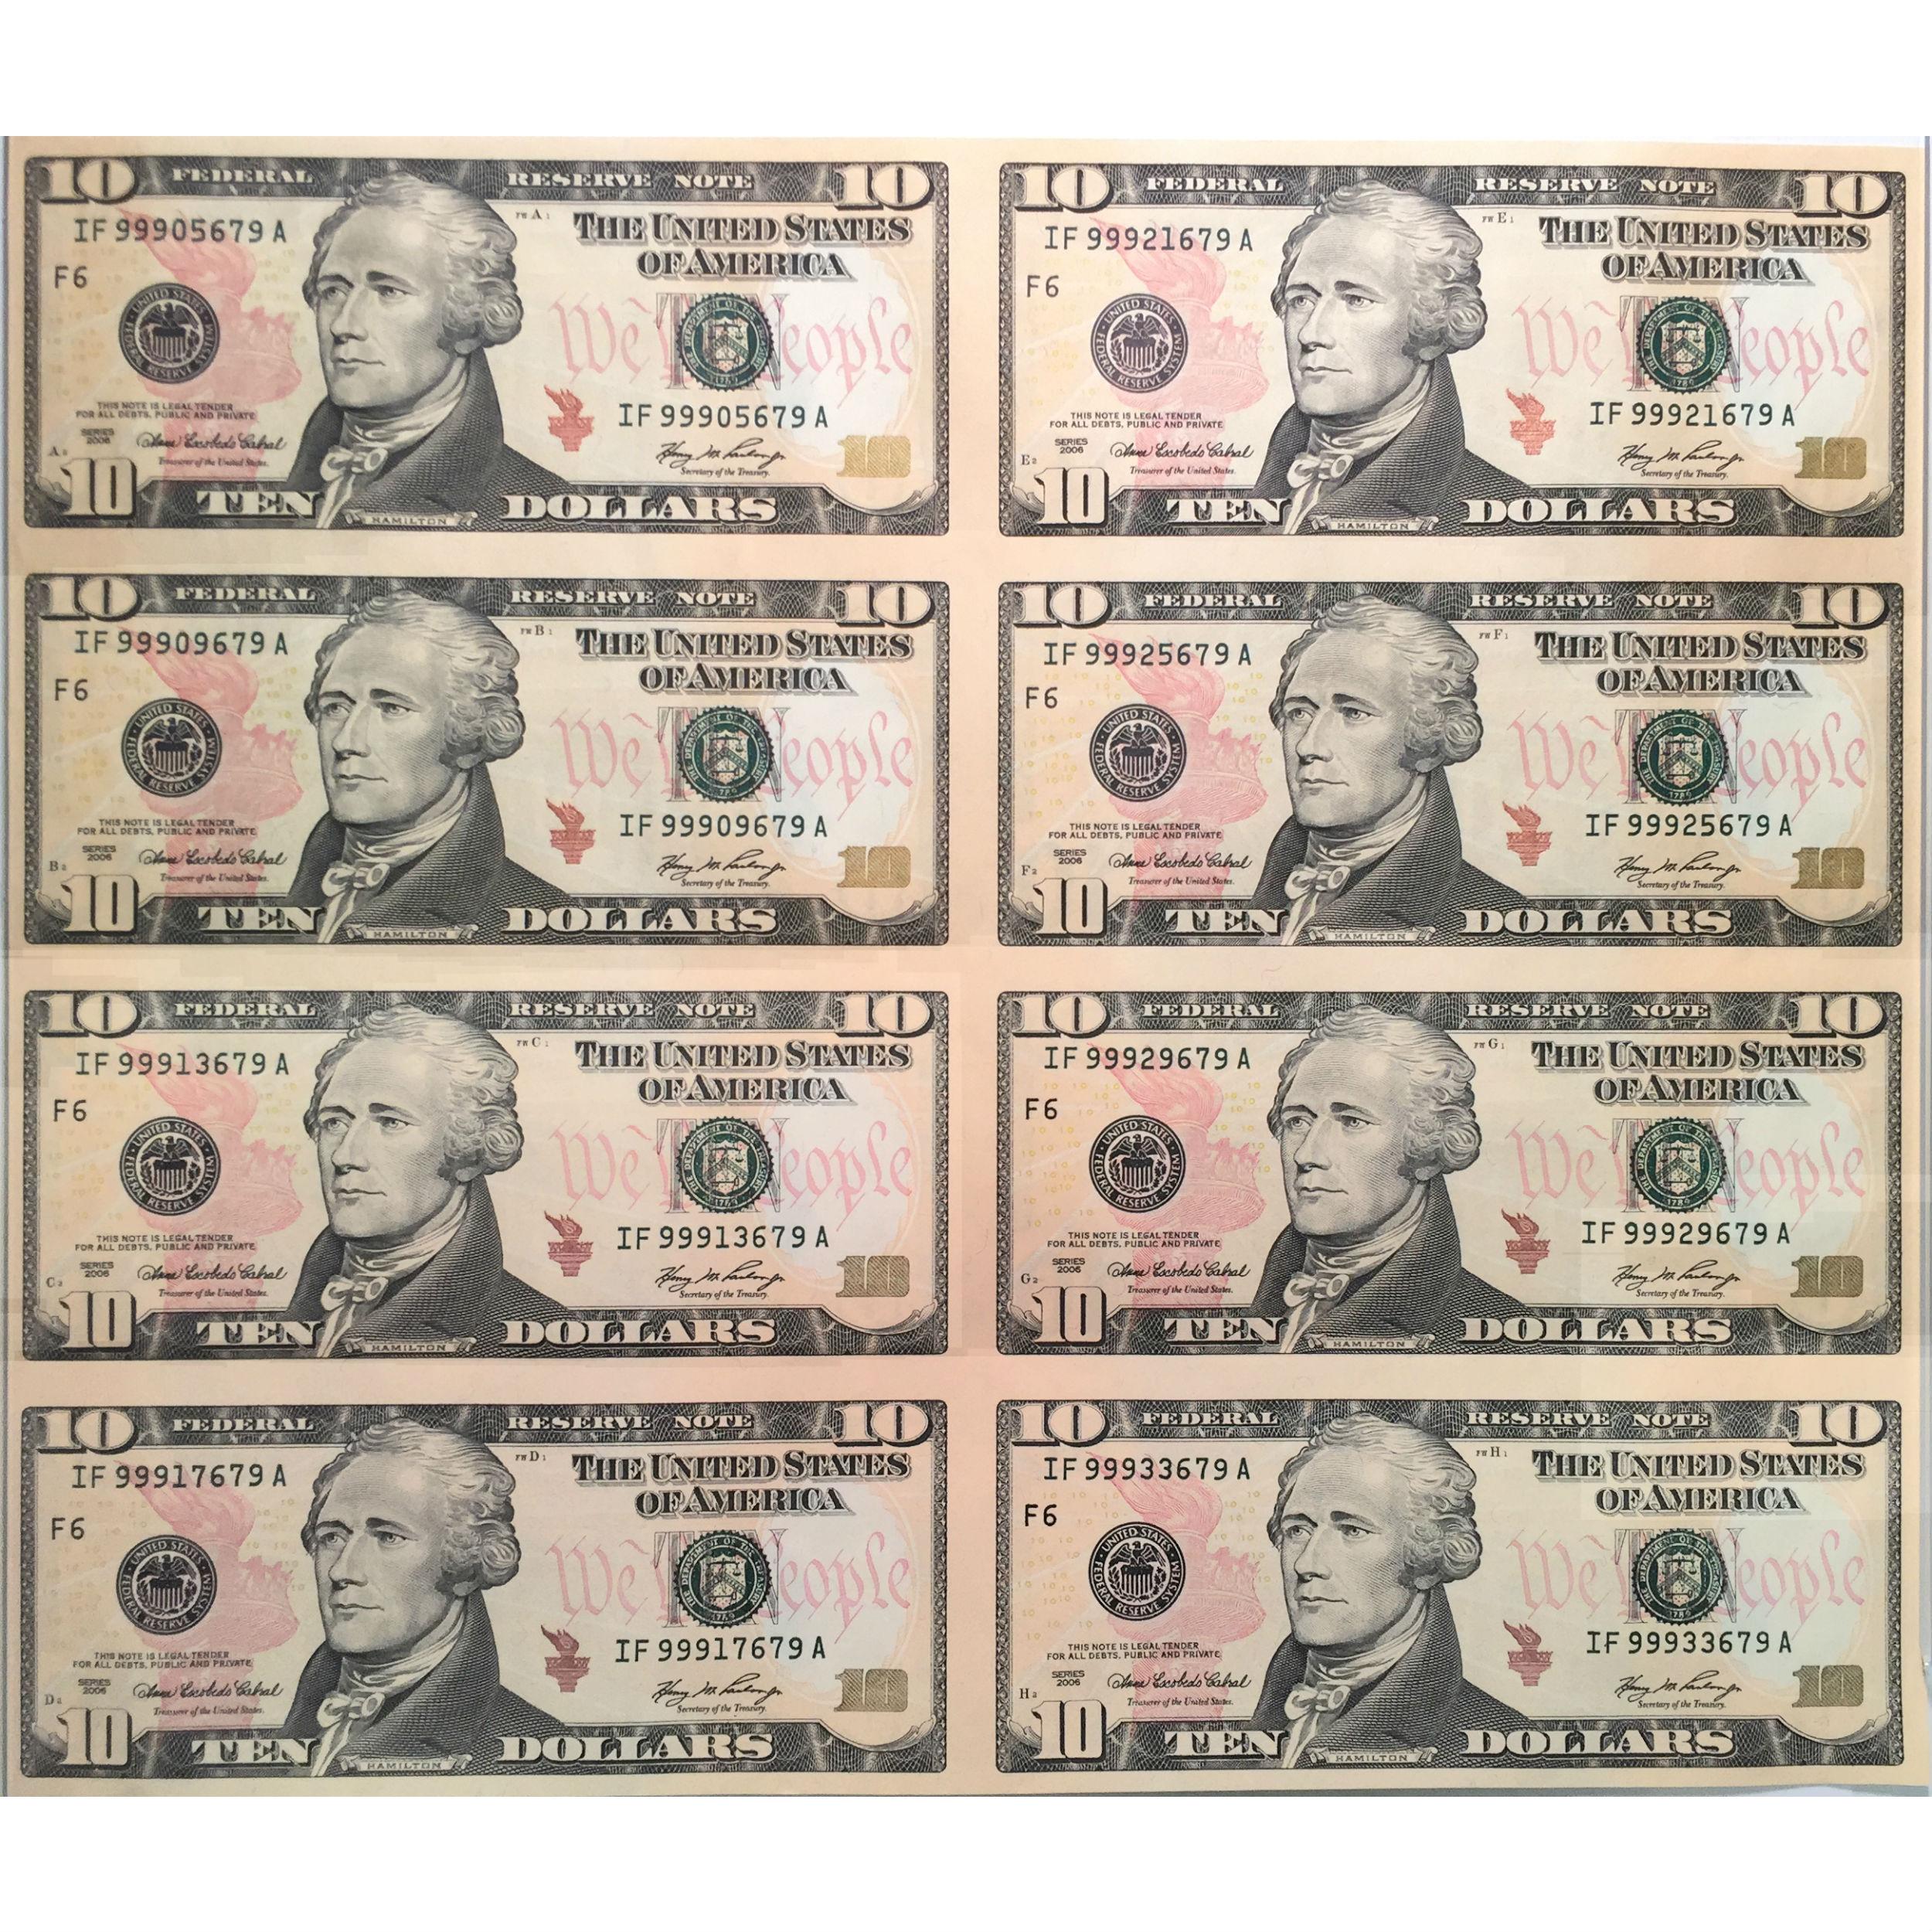 Uncut Currency Sheet 8 X 10 2006 Unc Golden Eagle Coins